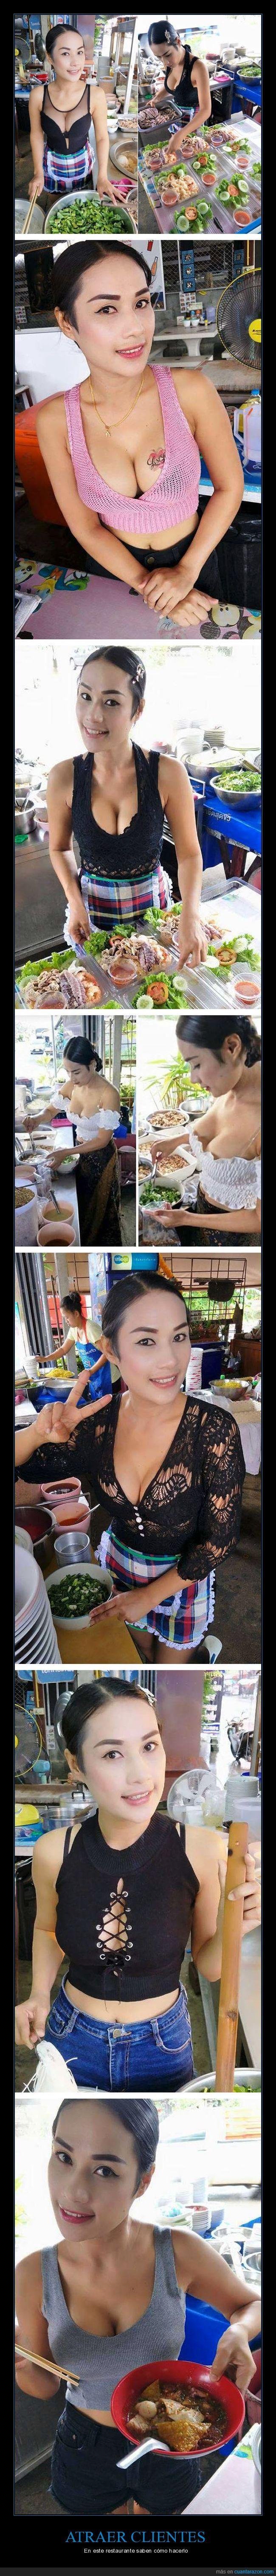 atraer,restaurante,sorpresa,thai,thailandia